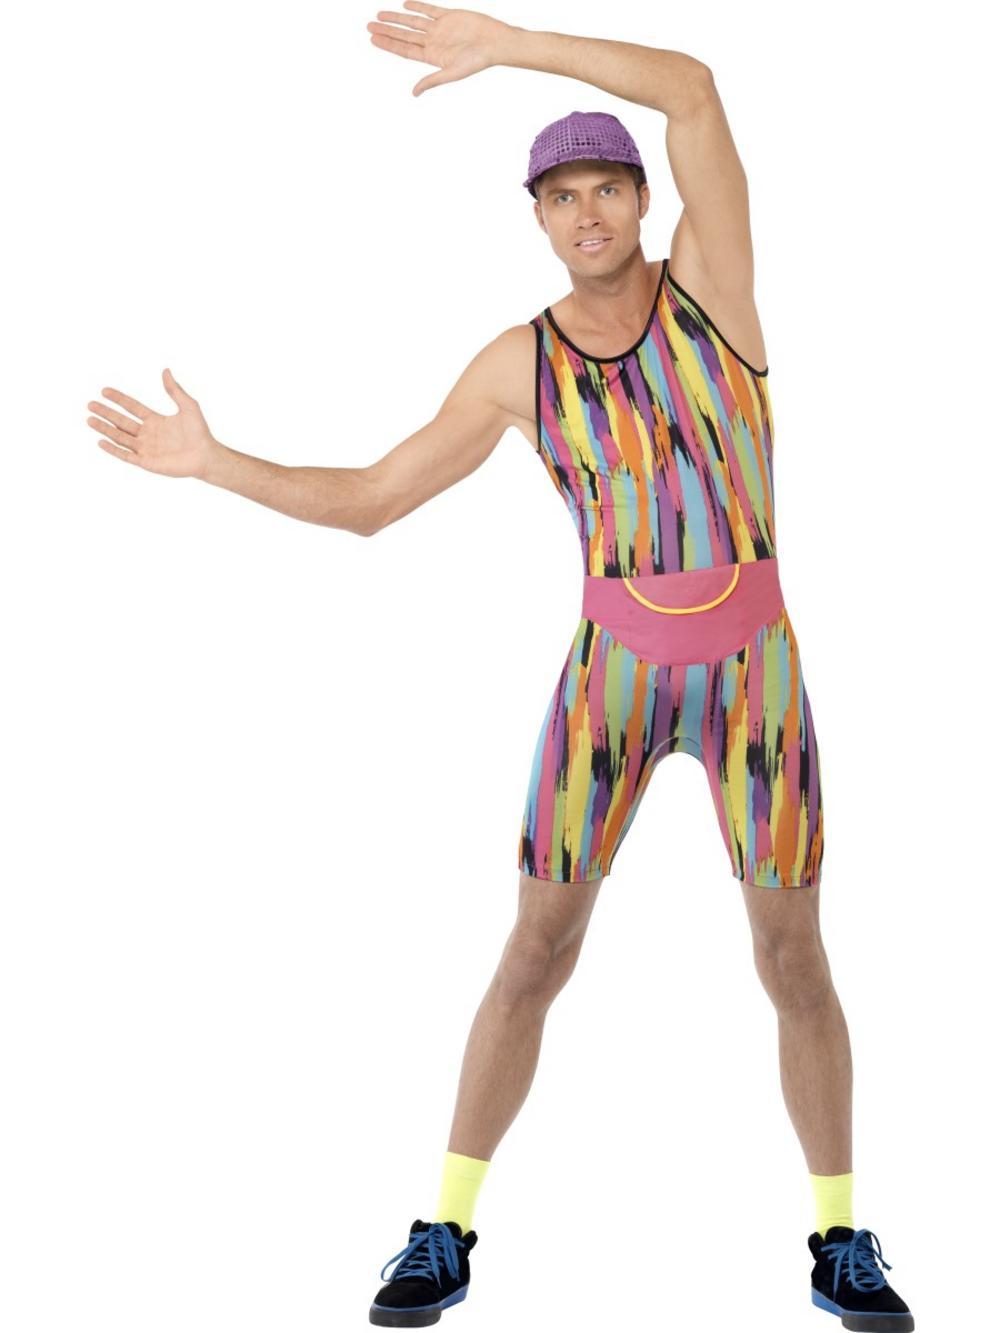 Aerobics Instructor Mens Costume